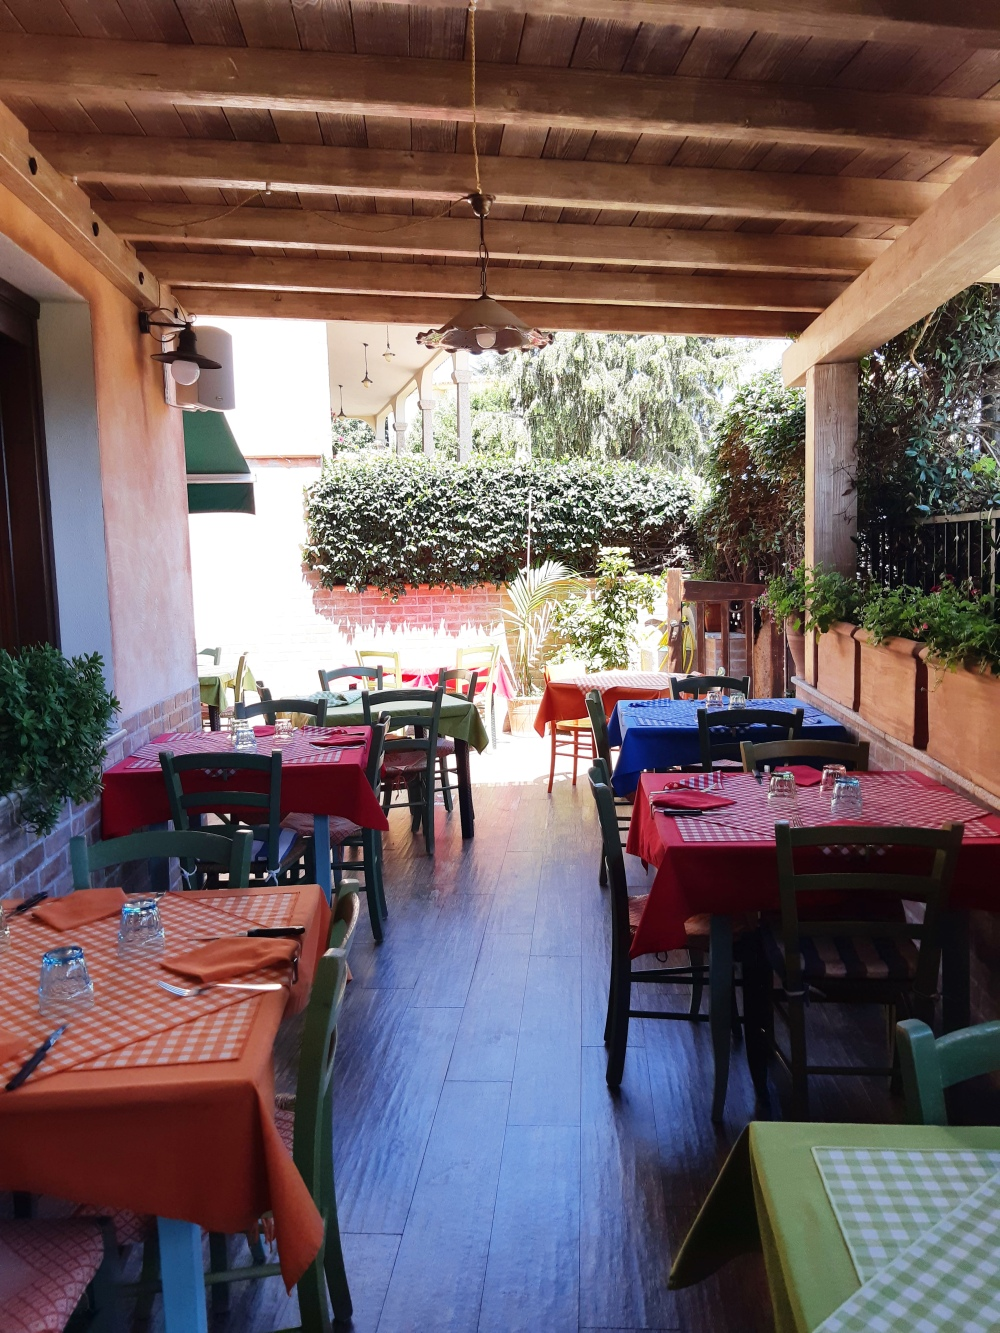 Blog cultura Torino-Posada-Trattoria Posada-Dove mangiare a Posada-Nuoro-Sardegna-Vacanza in Sardegna-Blog viaggi